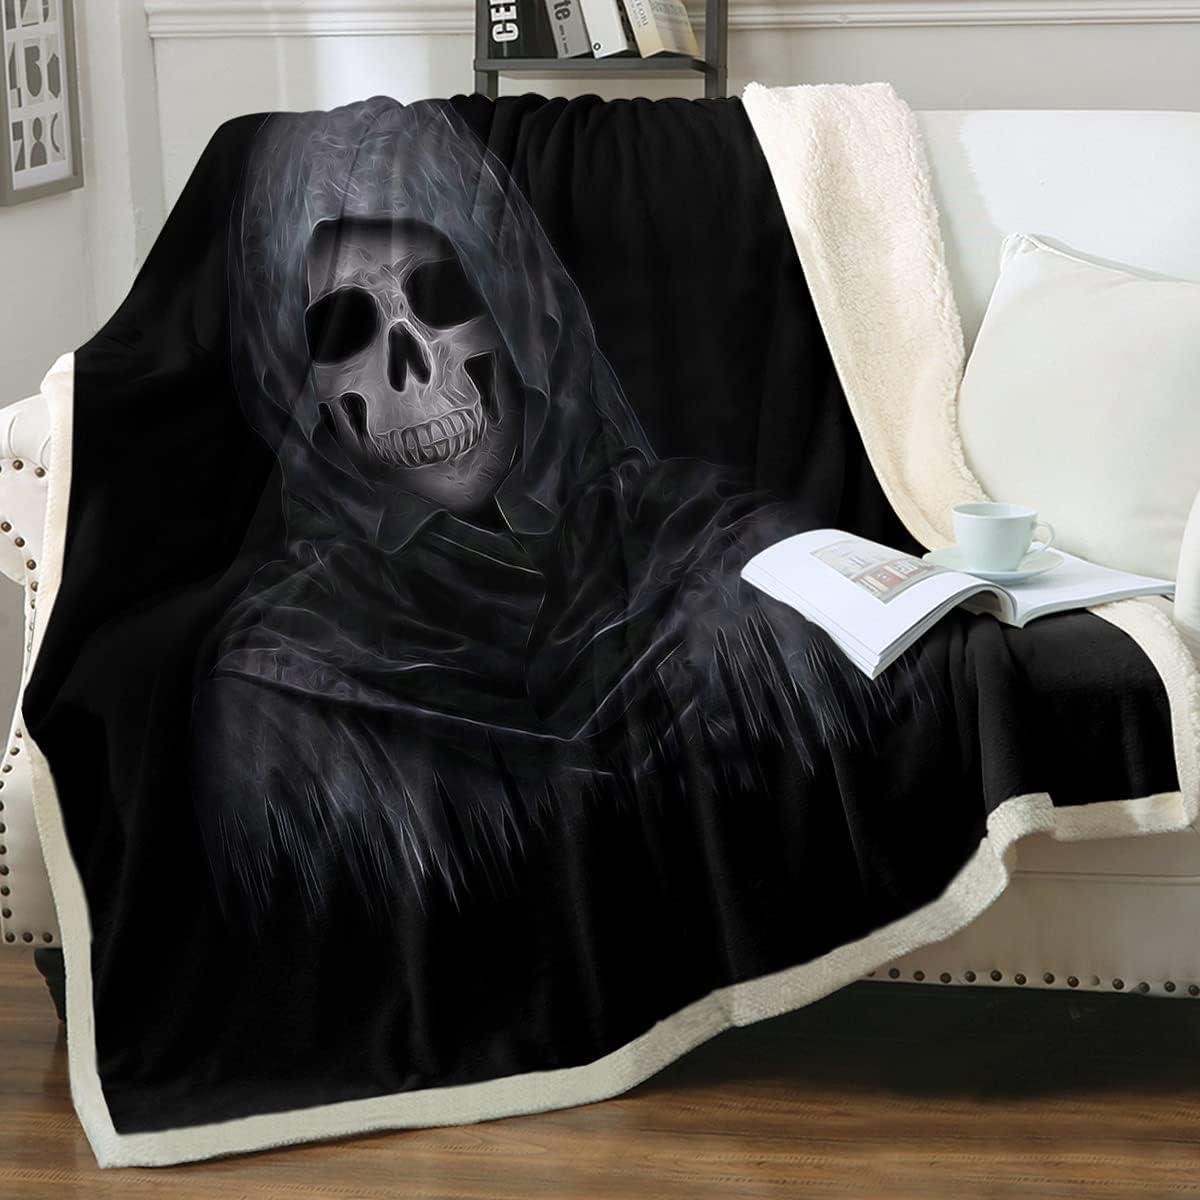 Sleepwish Dark Fashionable Skull Throw Grunge Print 3D New color Blanket